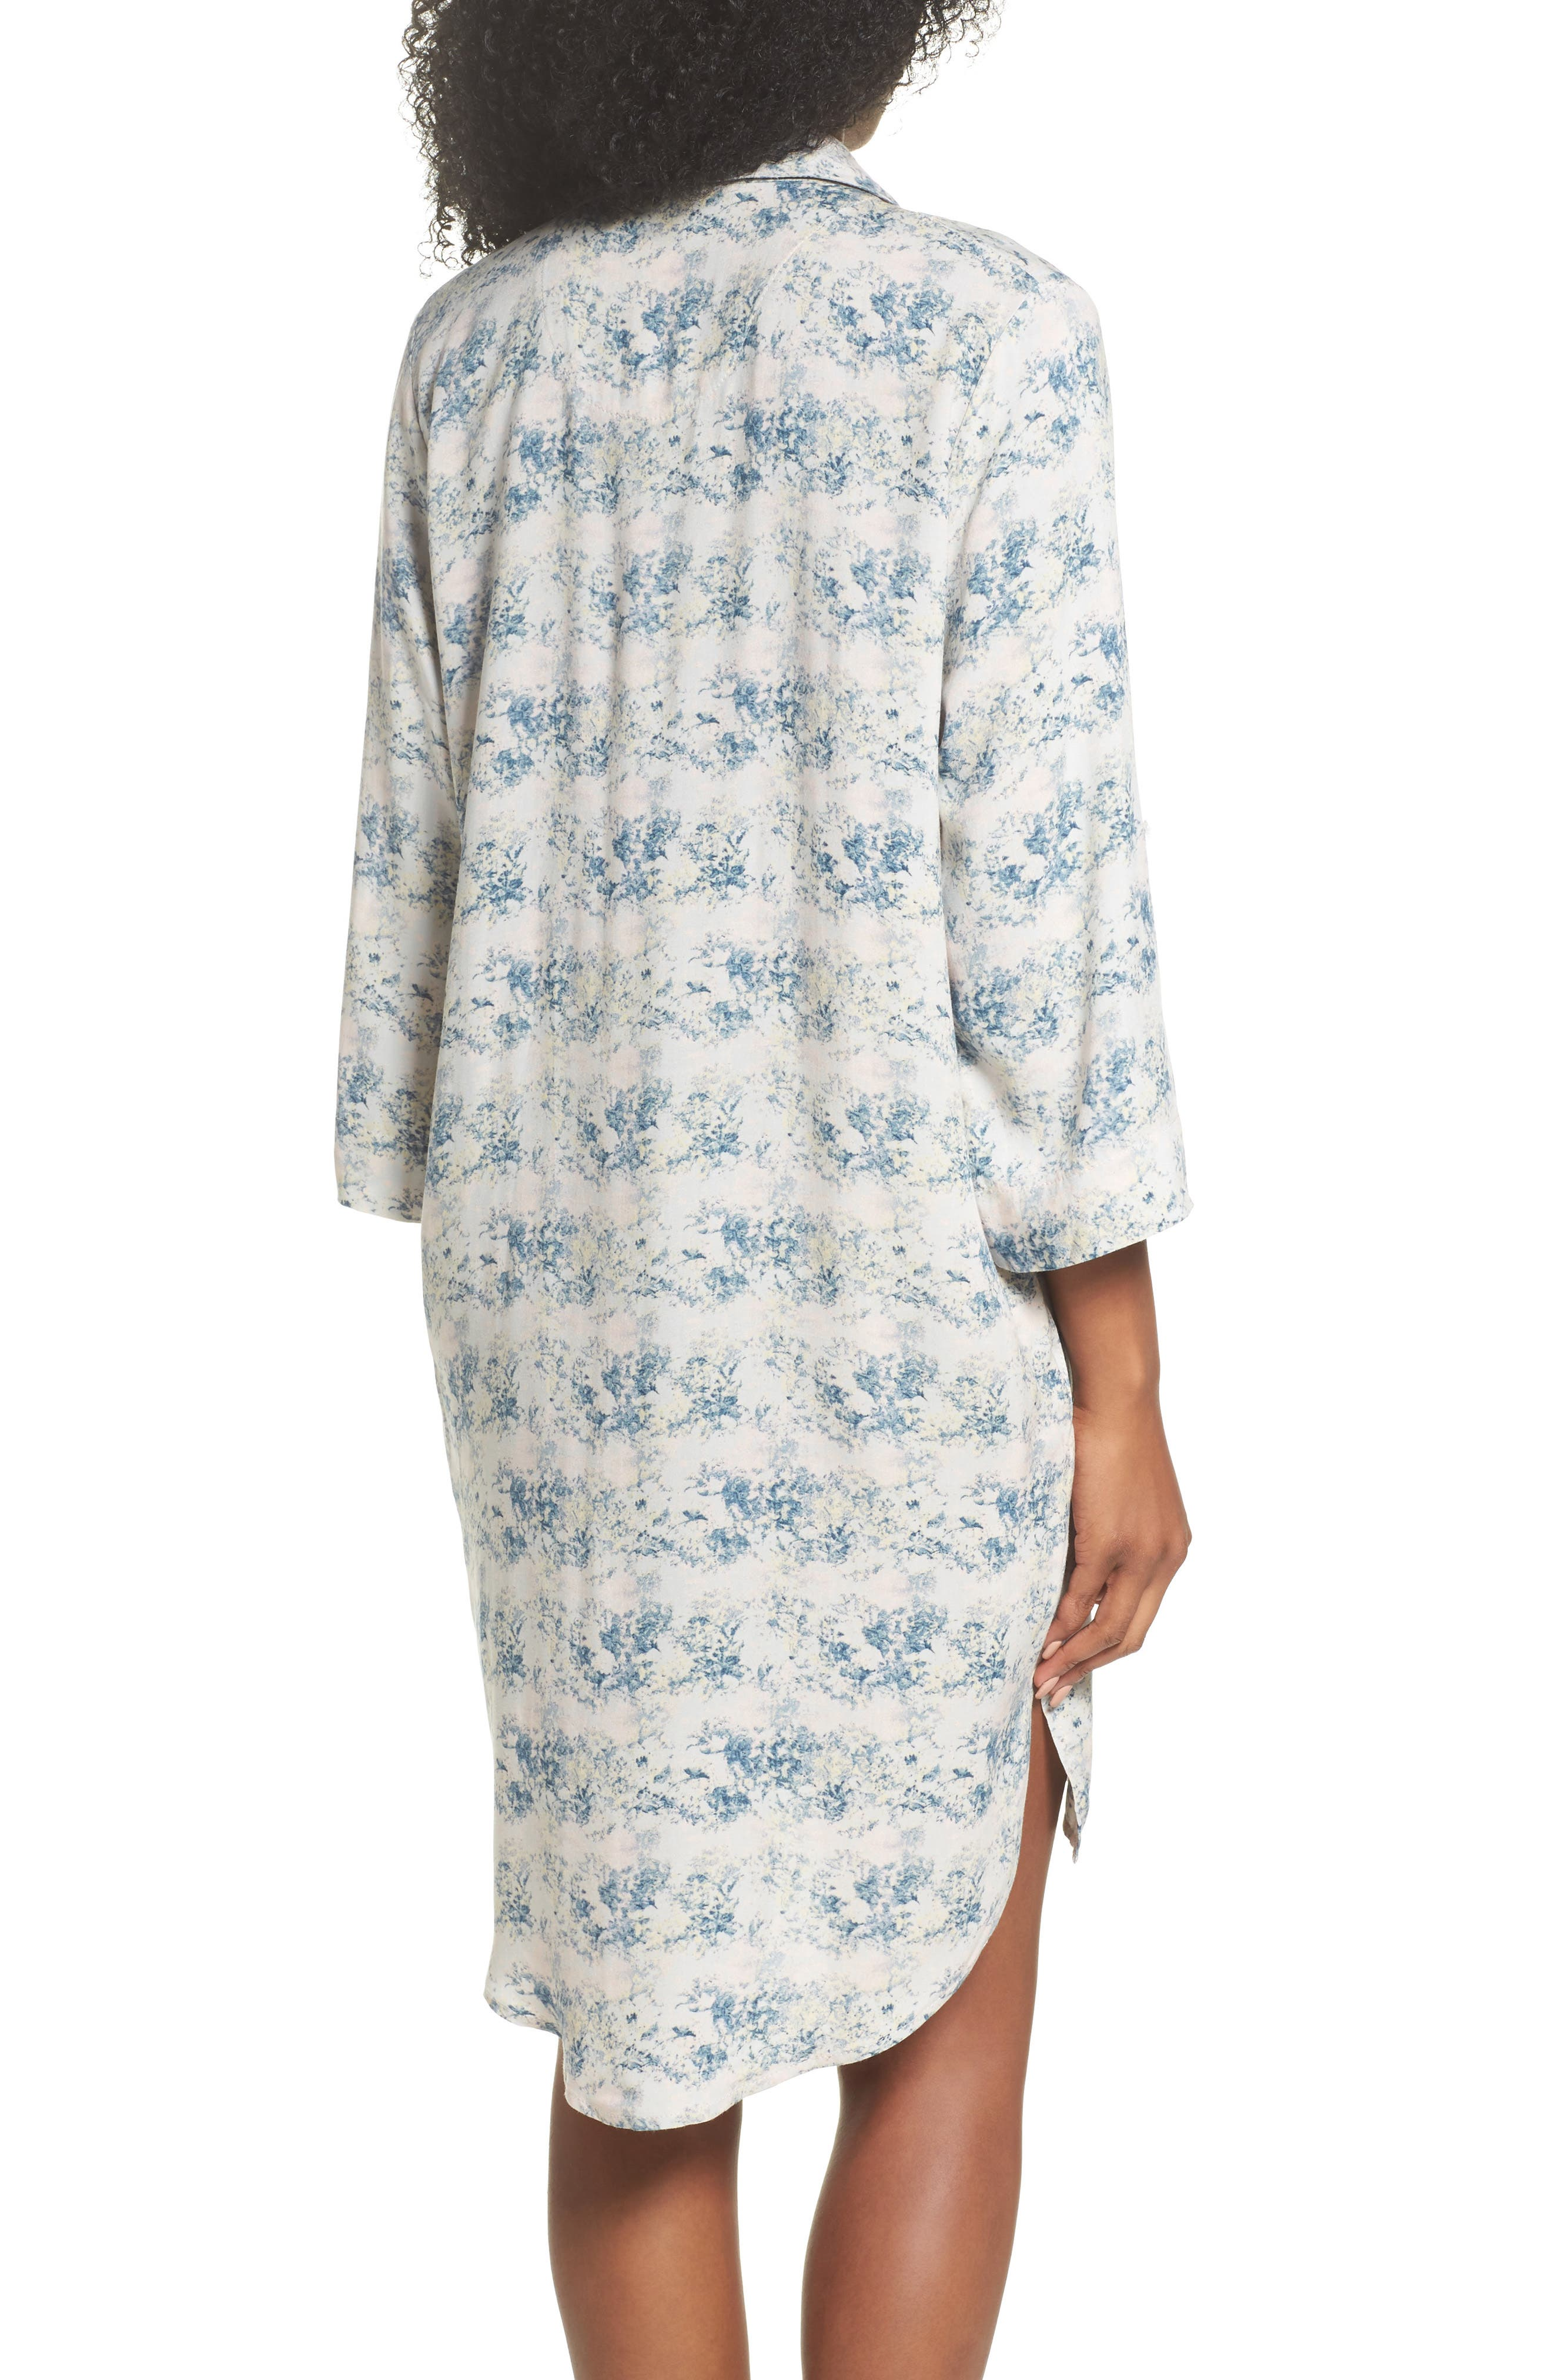 PAPINELLE,                             Floral Print Sleep Shirt,                             Alternate thumbnail 2, color,                             403